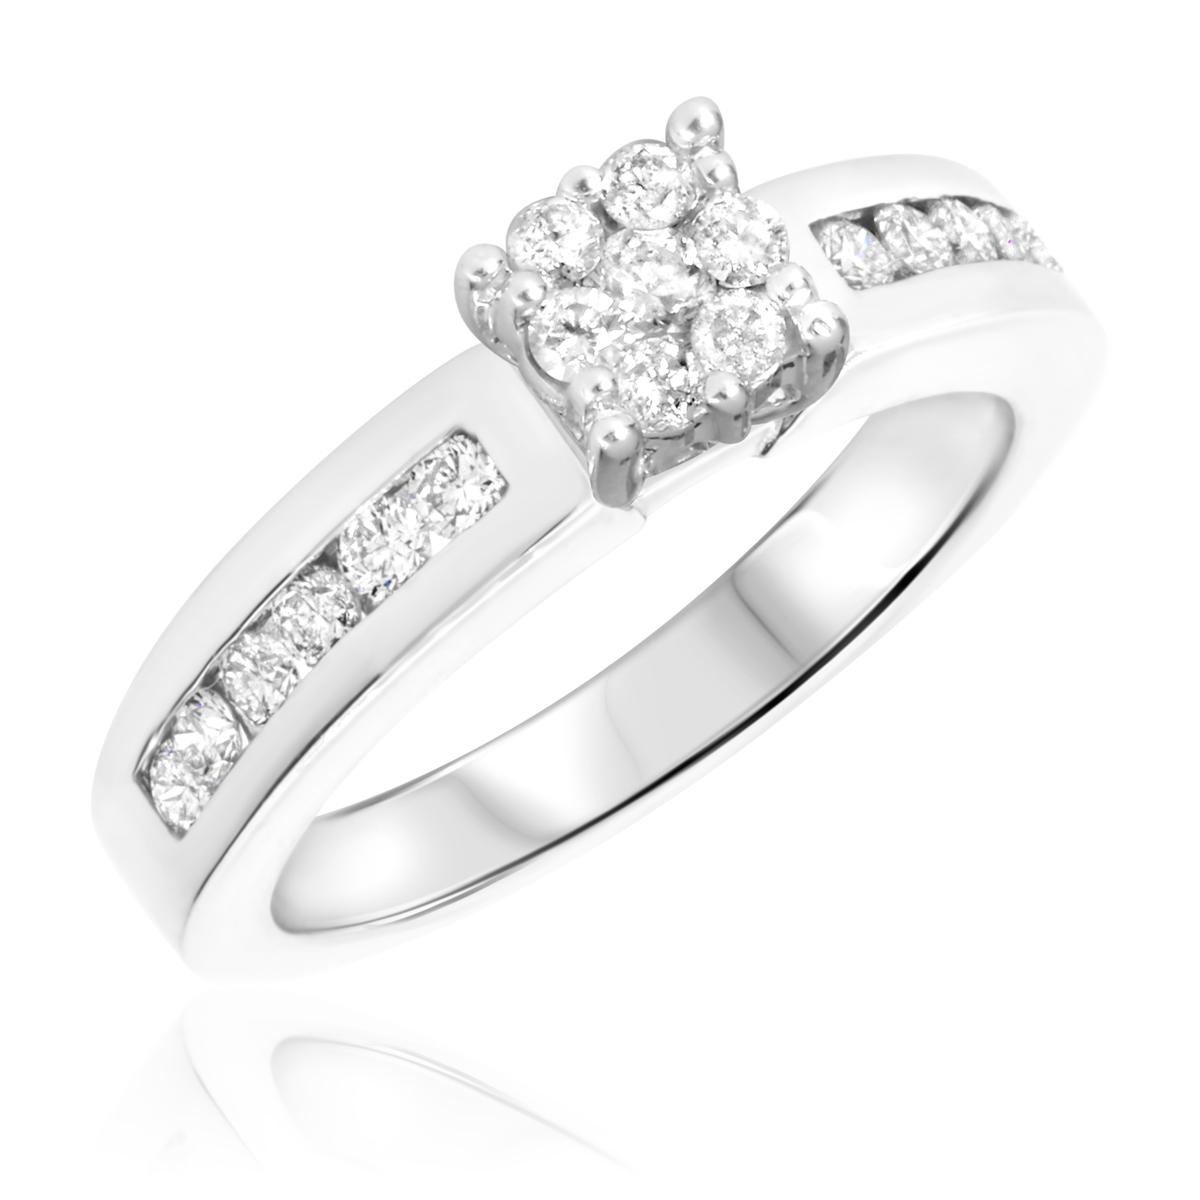 2/3 CT. T.W. Diamond Ladies Engagement Ring 14K White Gold- Size 8